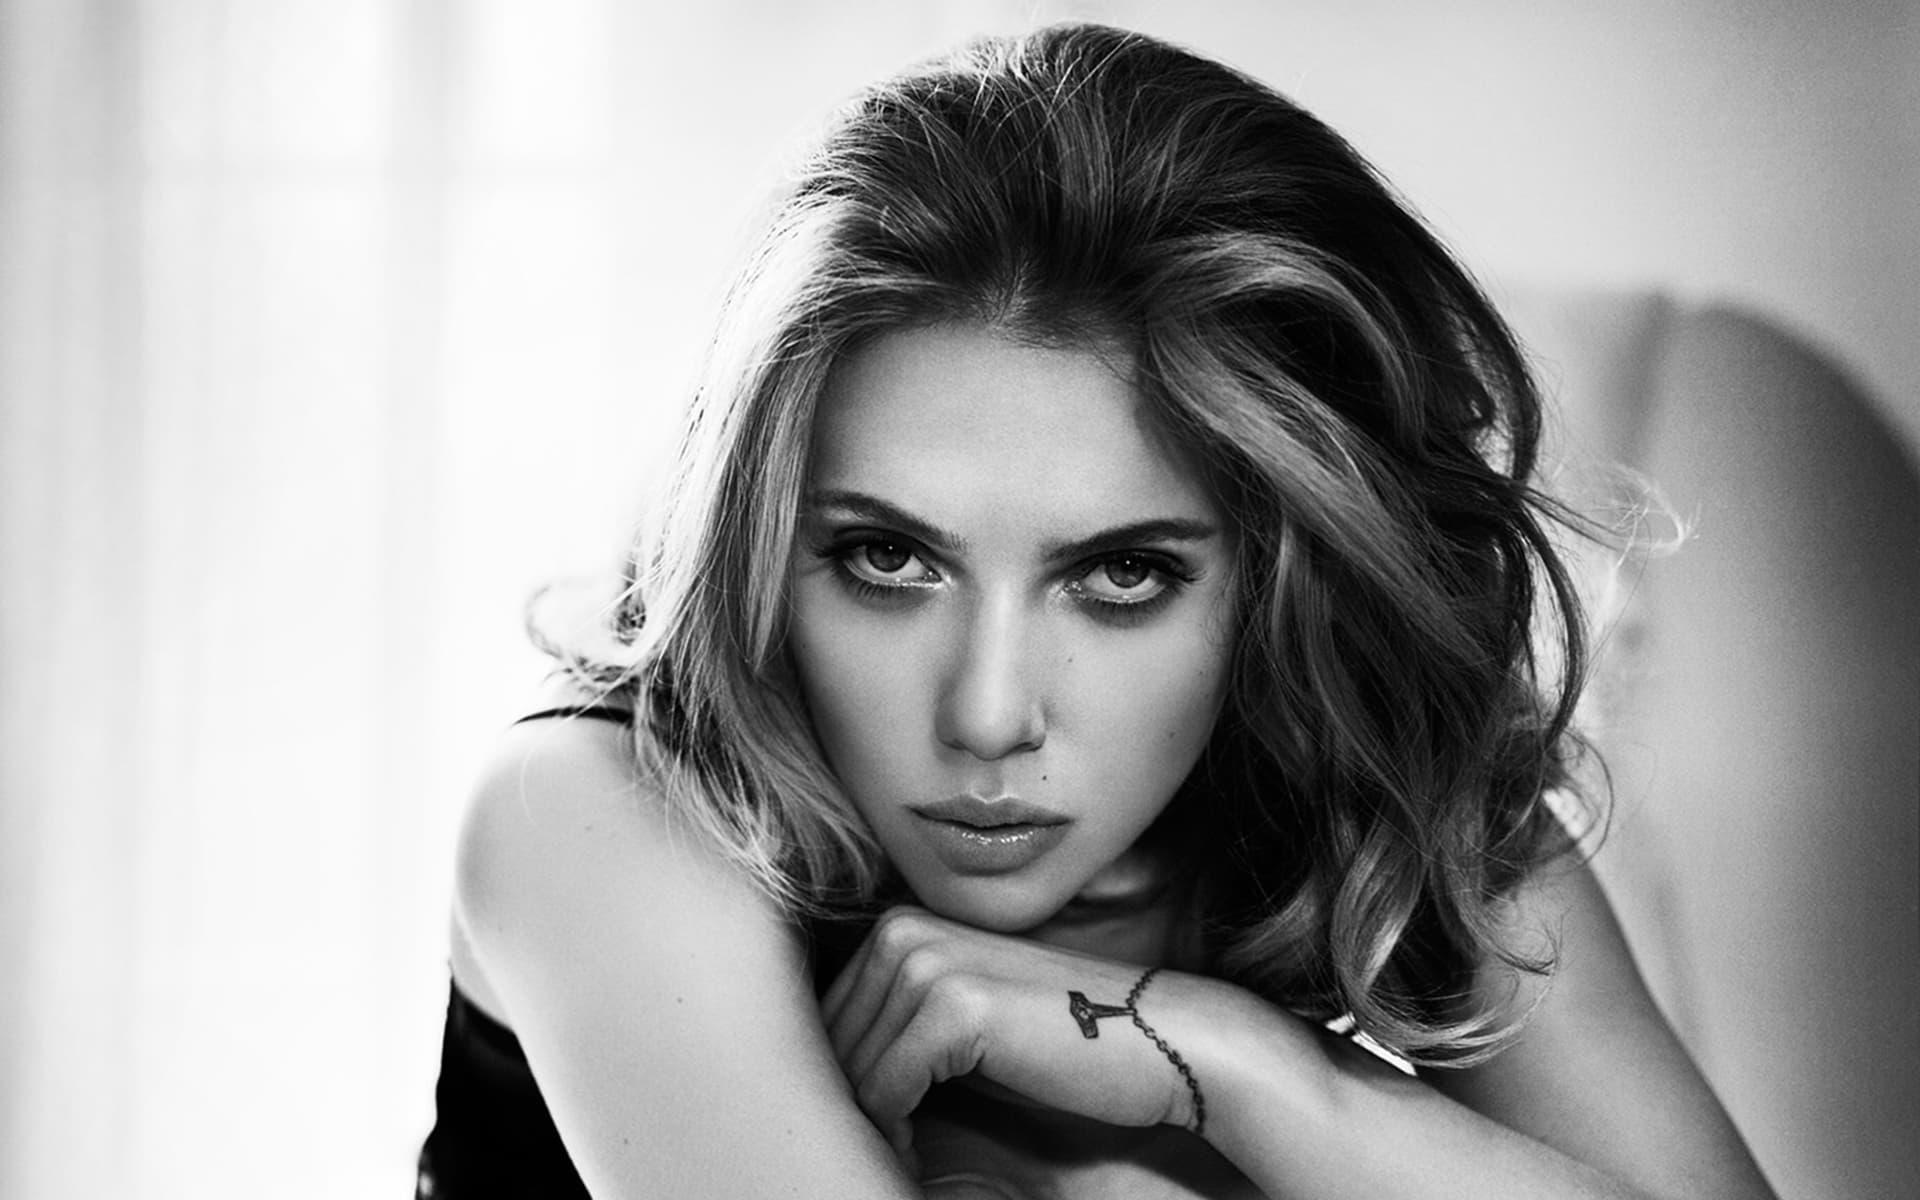 Monochrome Sexy Scarlett Johansson Wallpaper 65786 1920x1200px